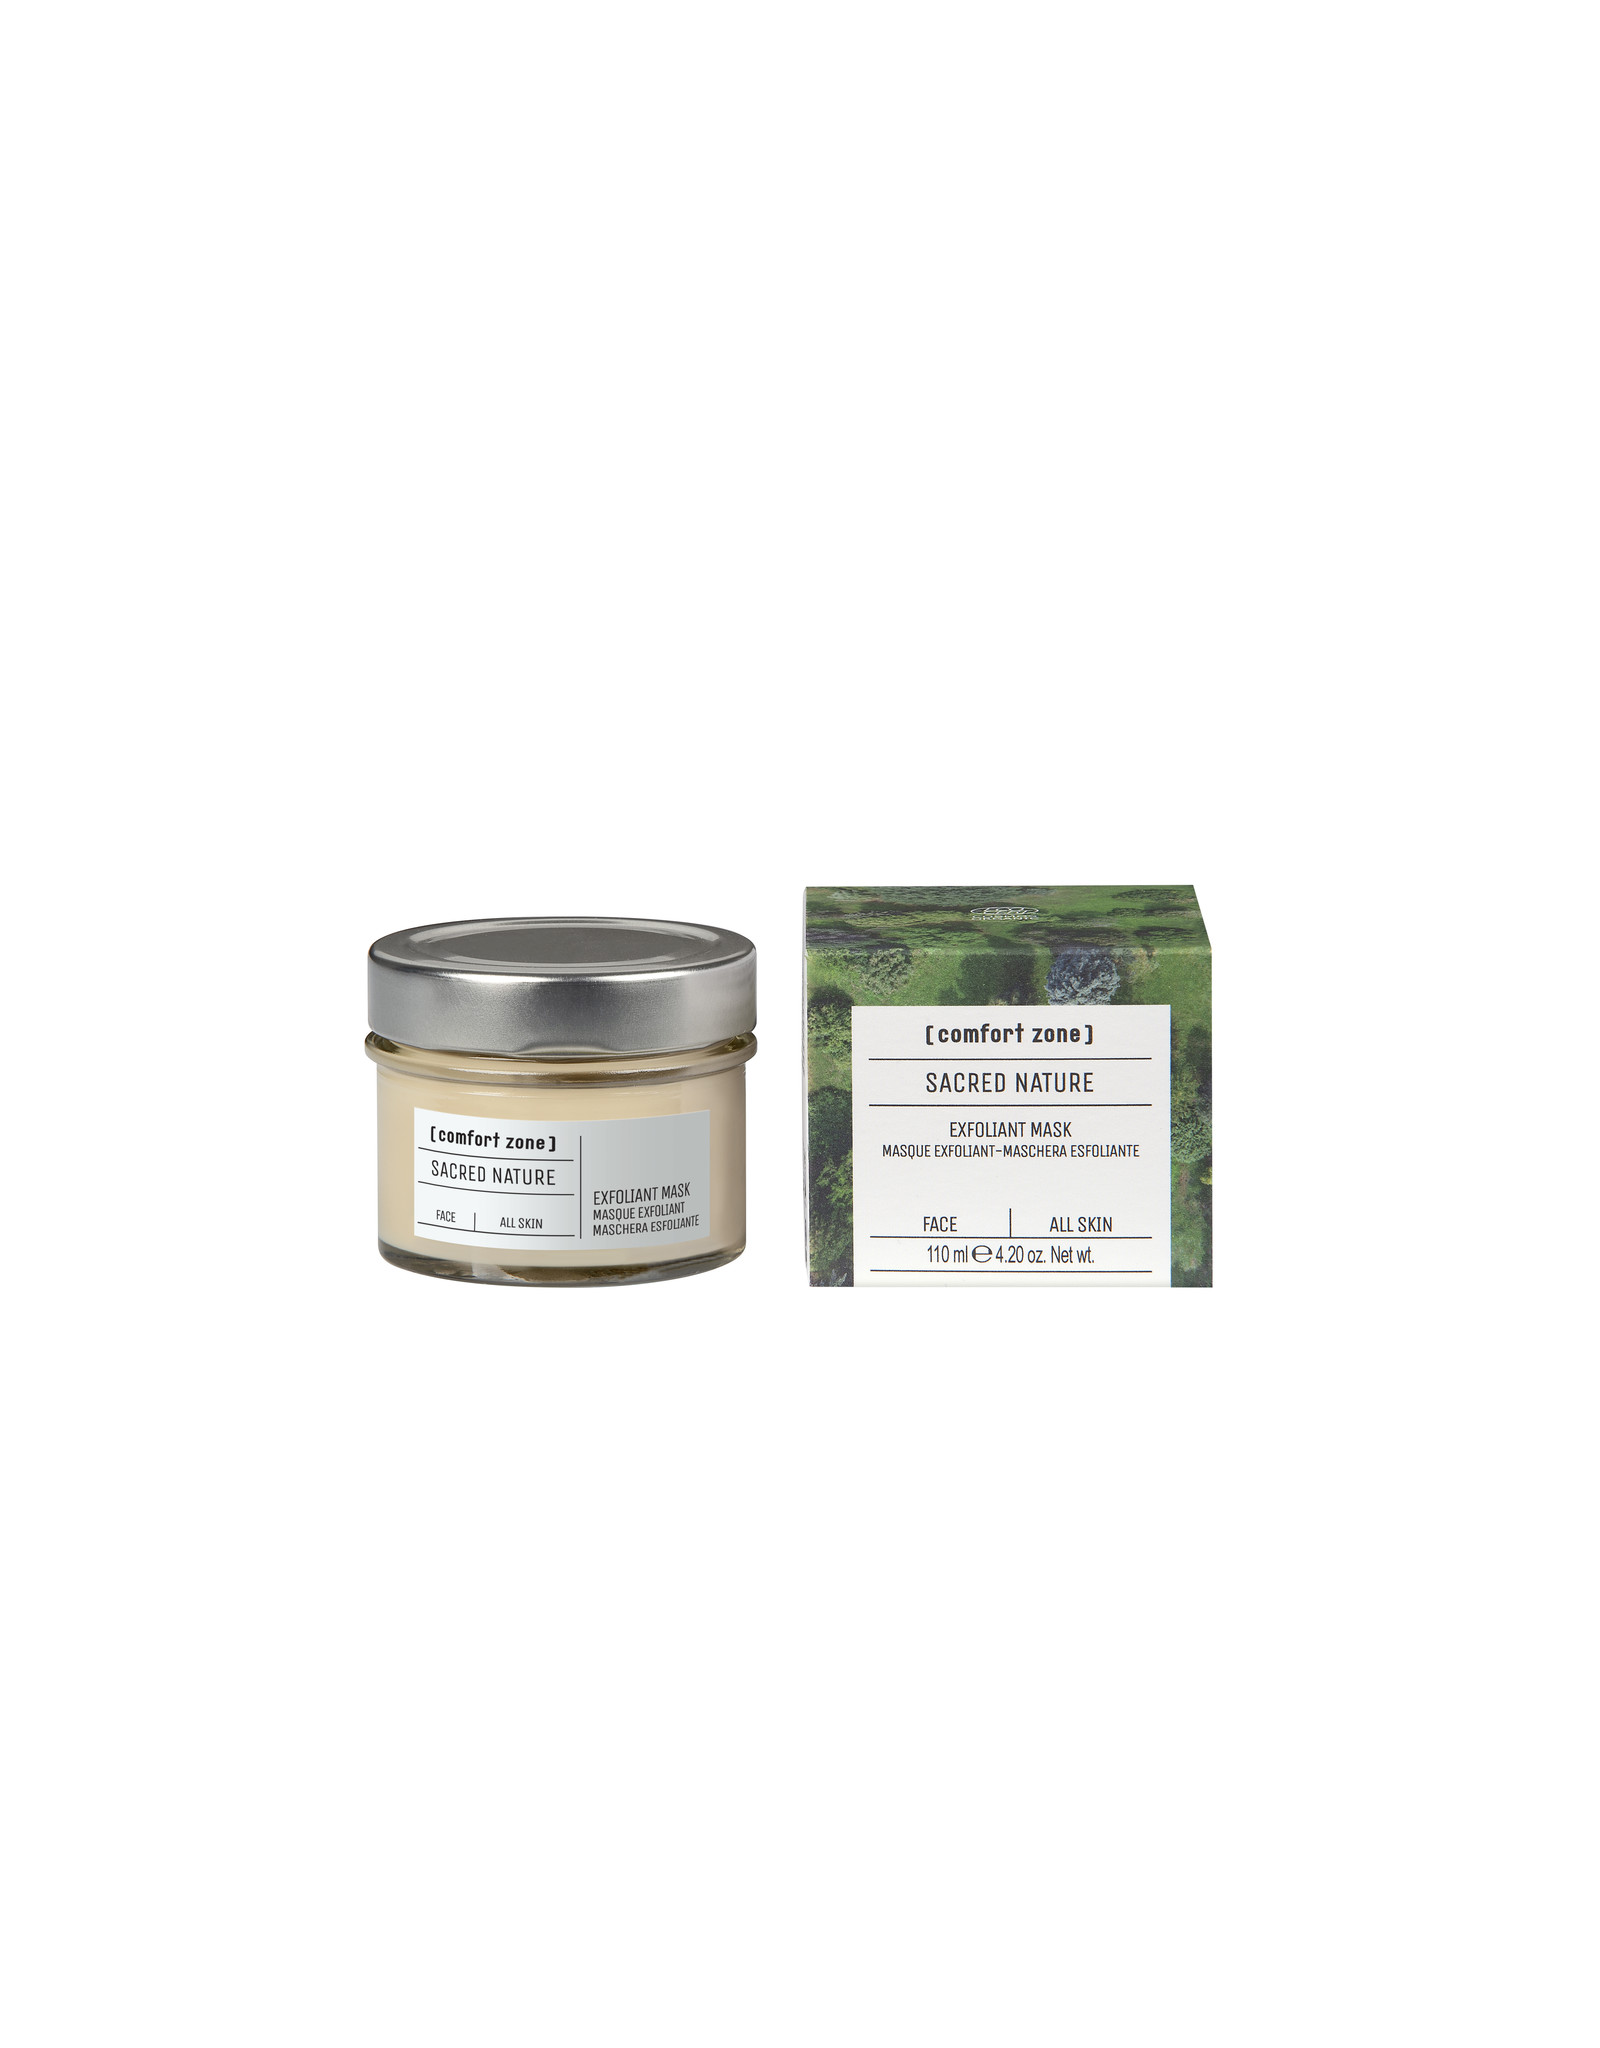 [Comfort Zone] Sacred Nature Exfoliant Mask Pot 110 ml